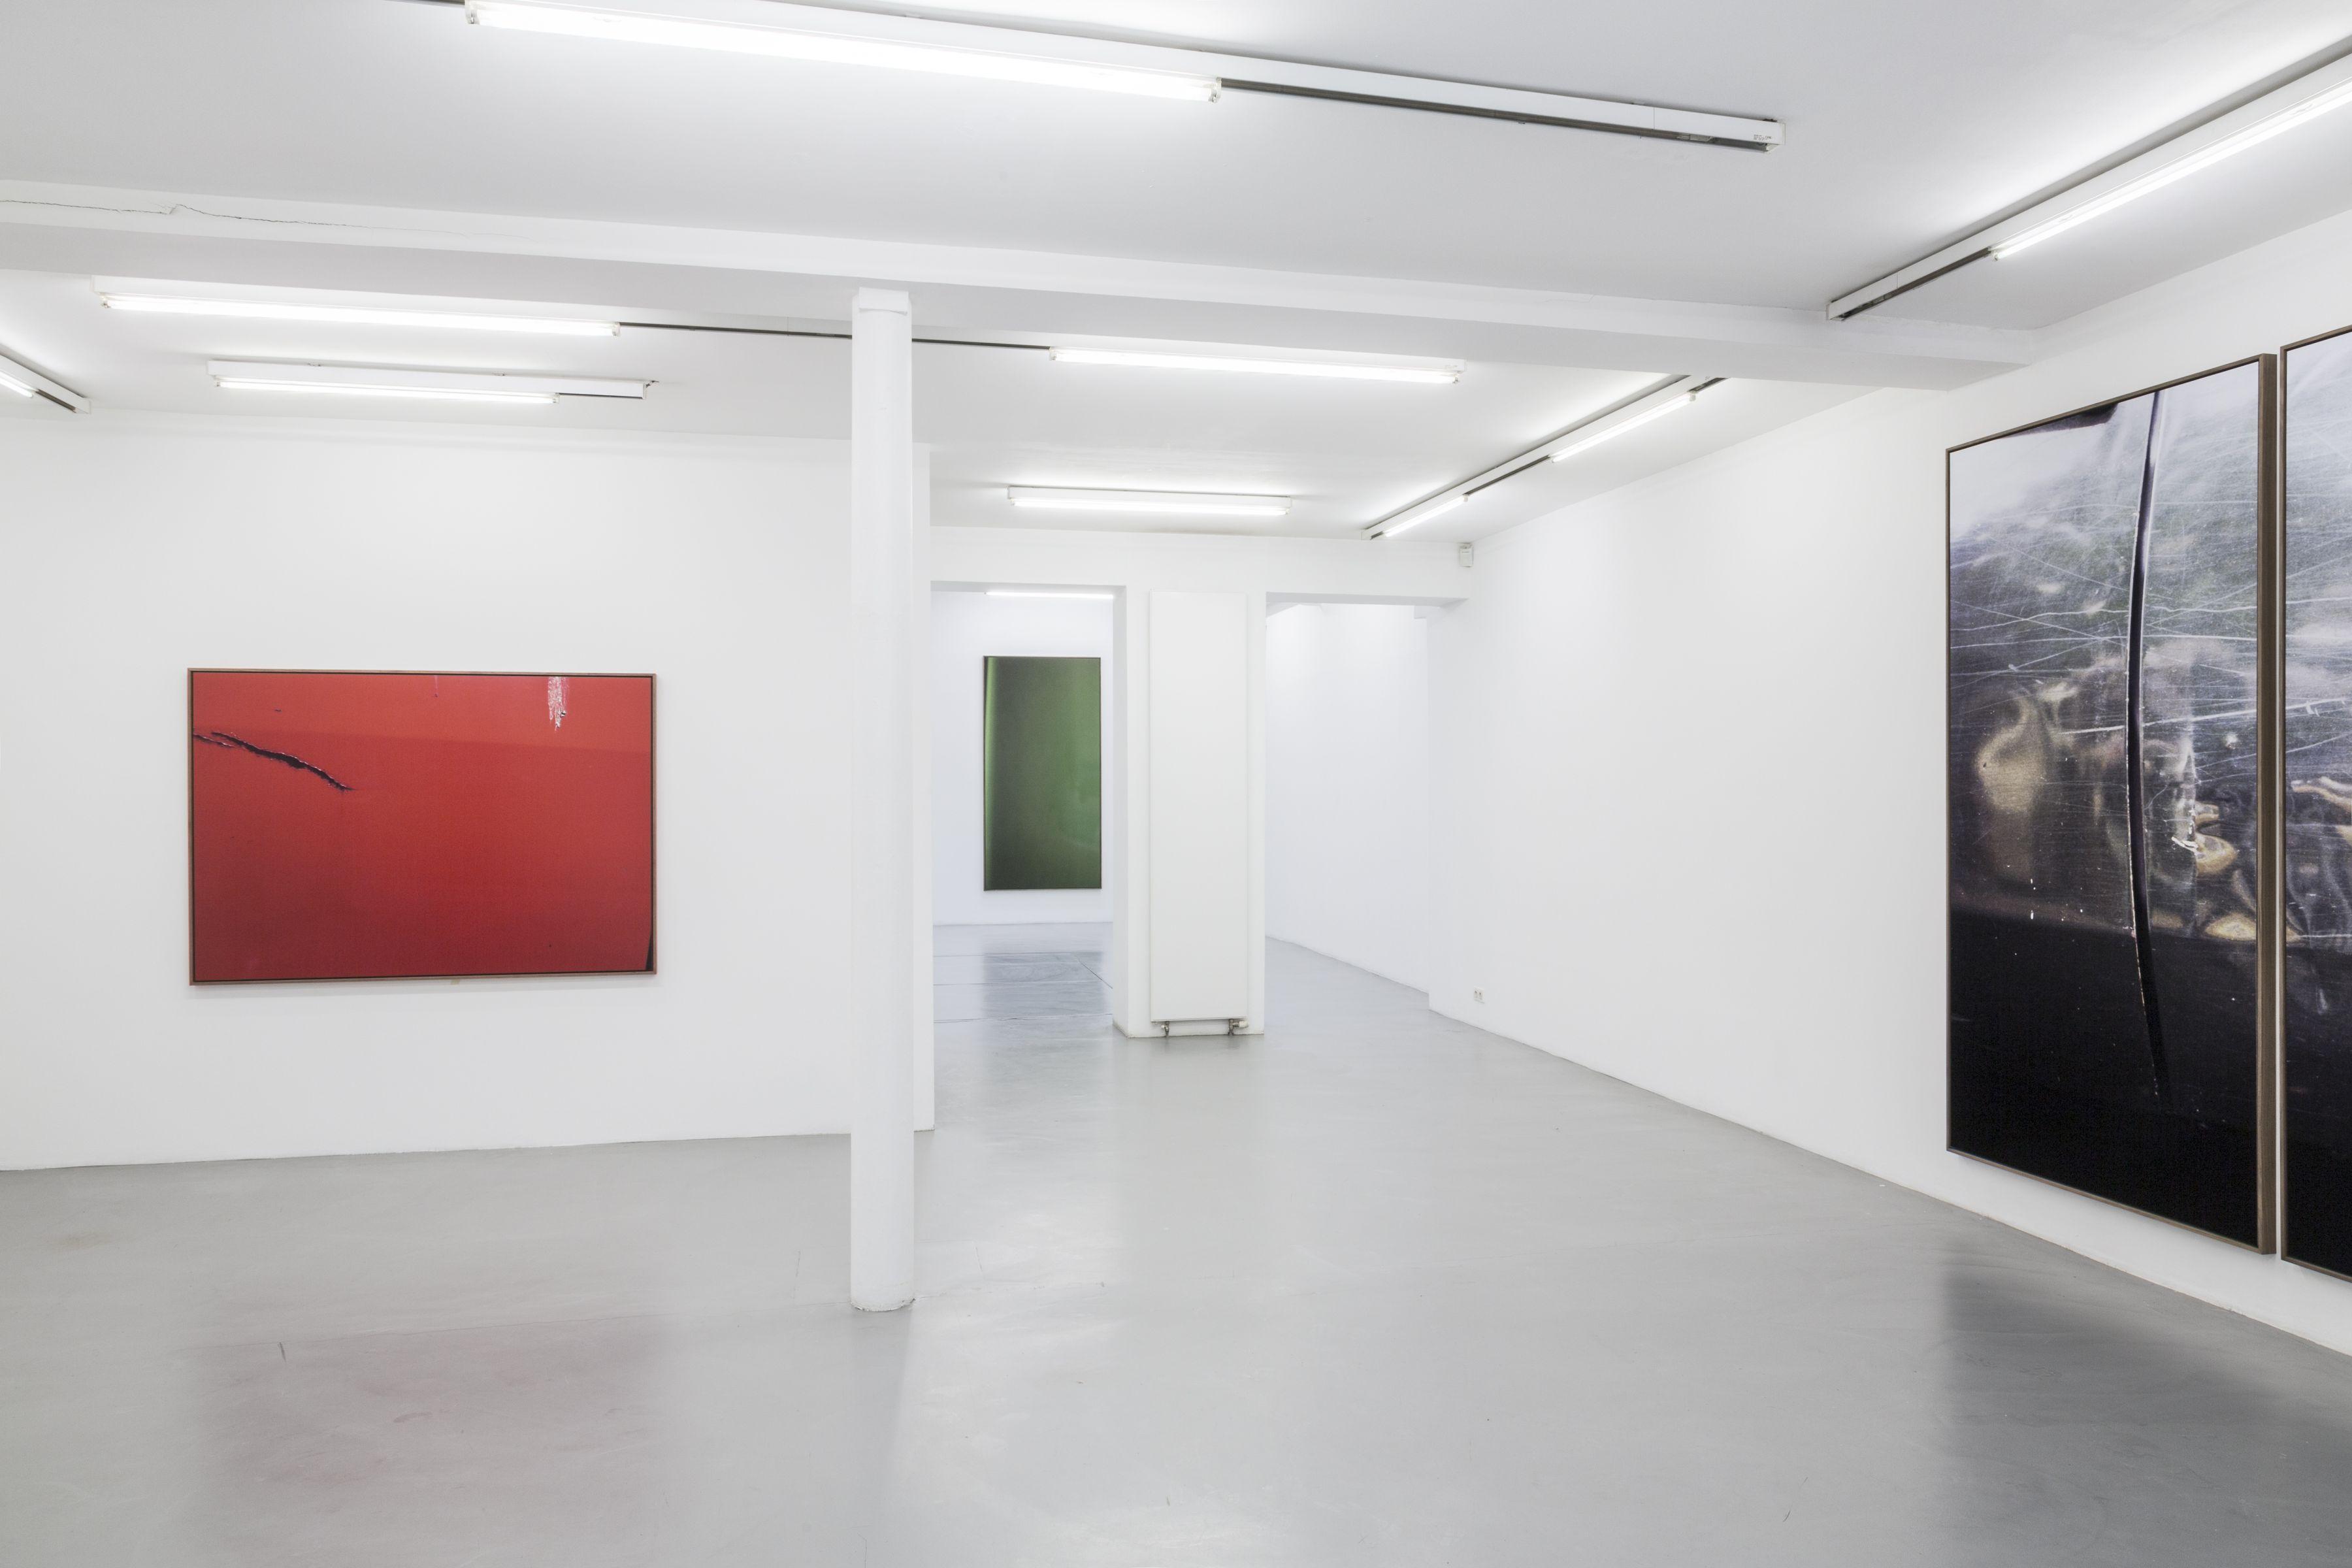 Jan Dibbets: New Colorstudies 1976/2012 – installation view 1